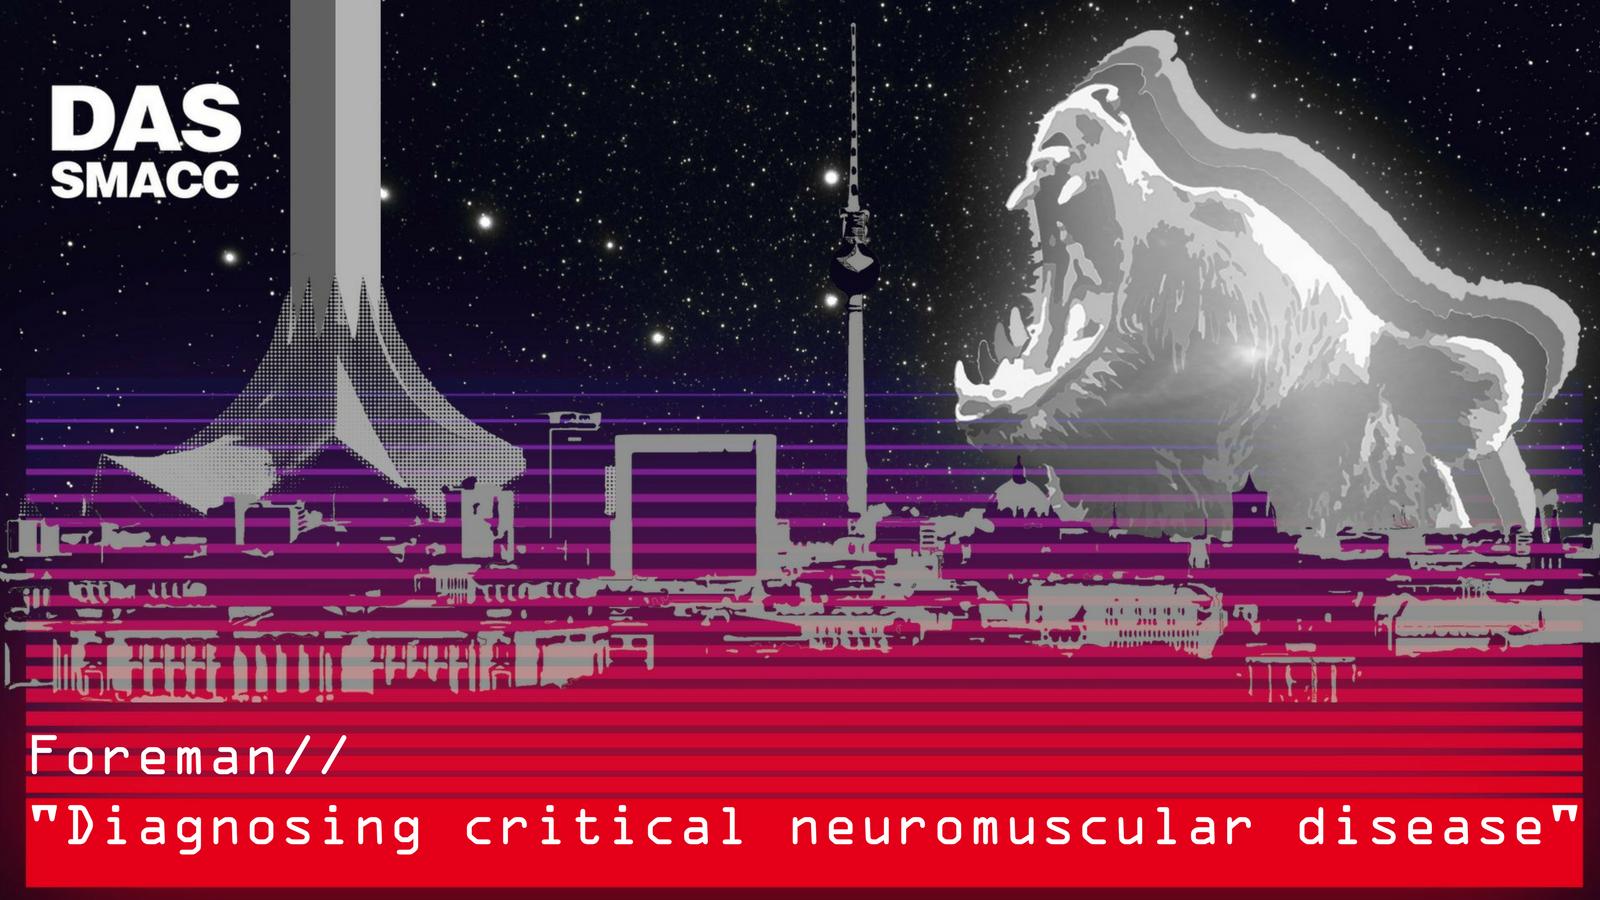 Diagnosing neuromuscular disease in Neuro Critical Care